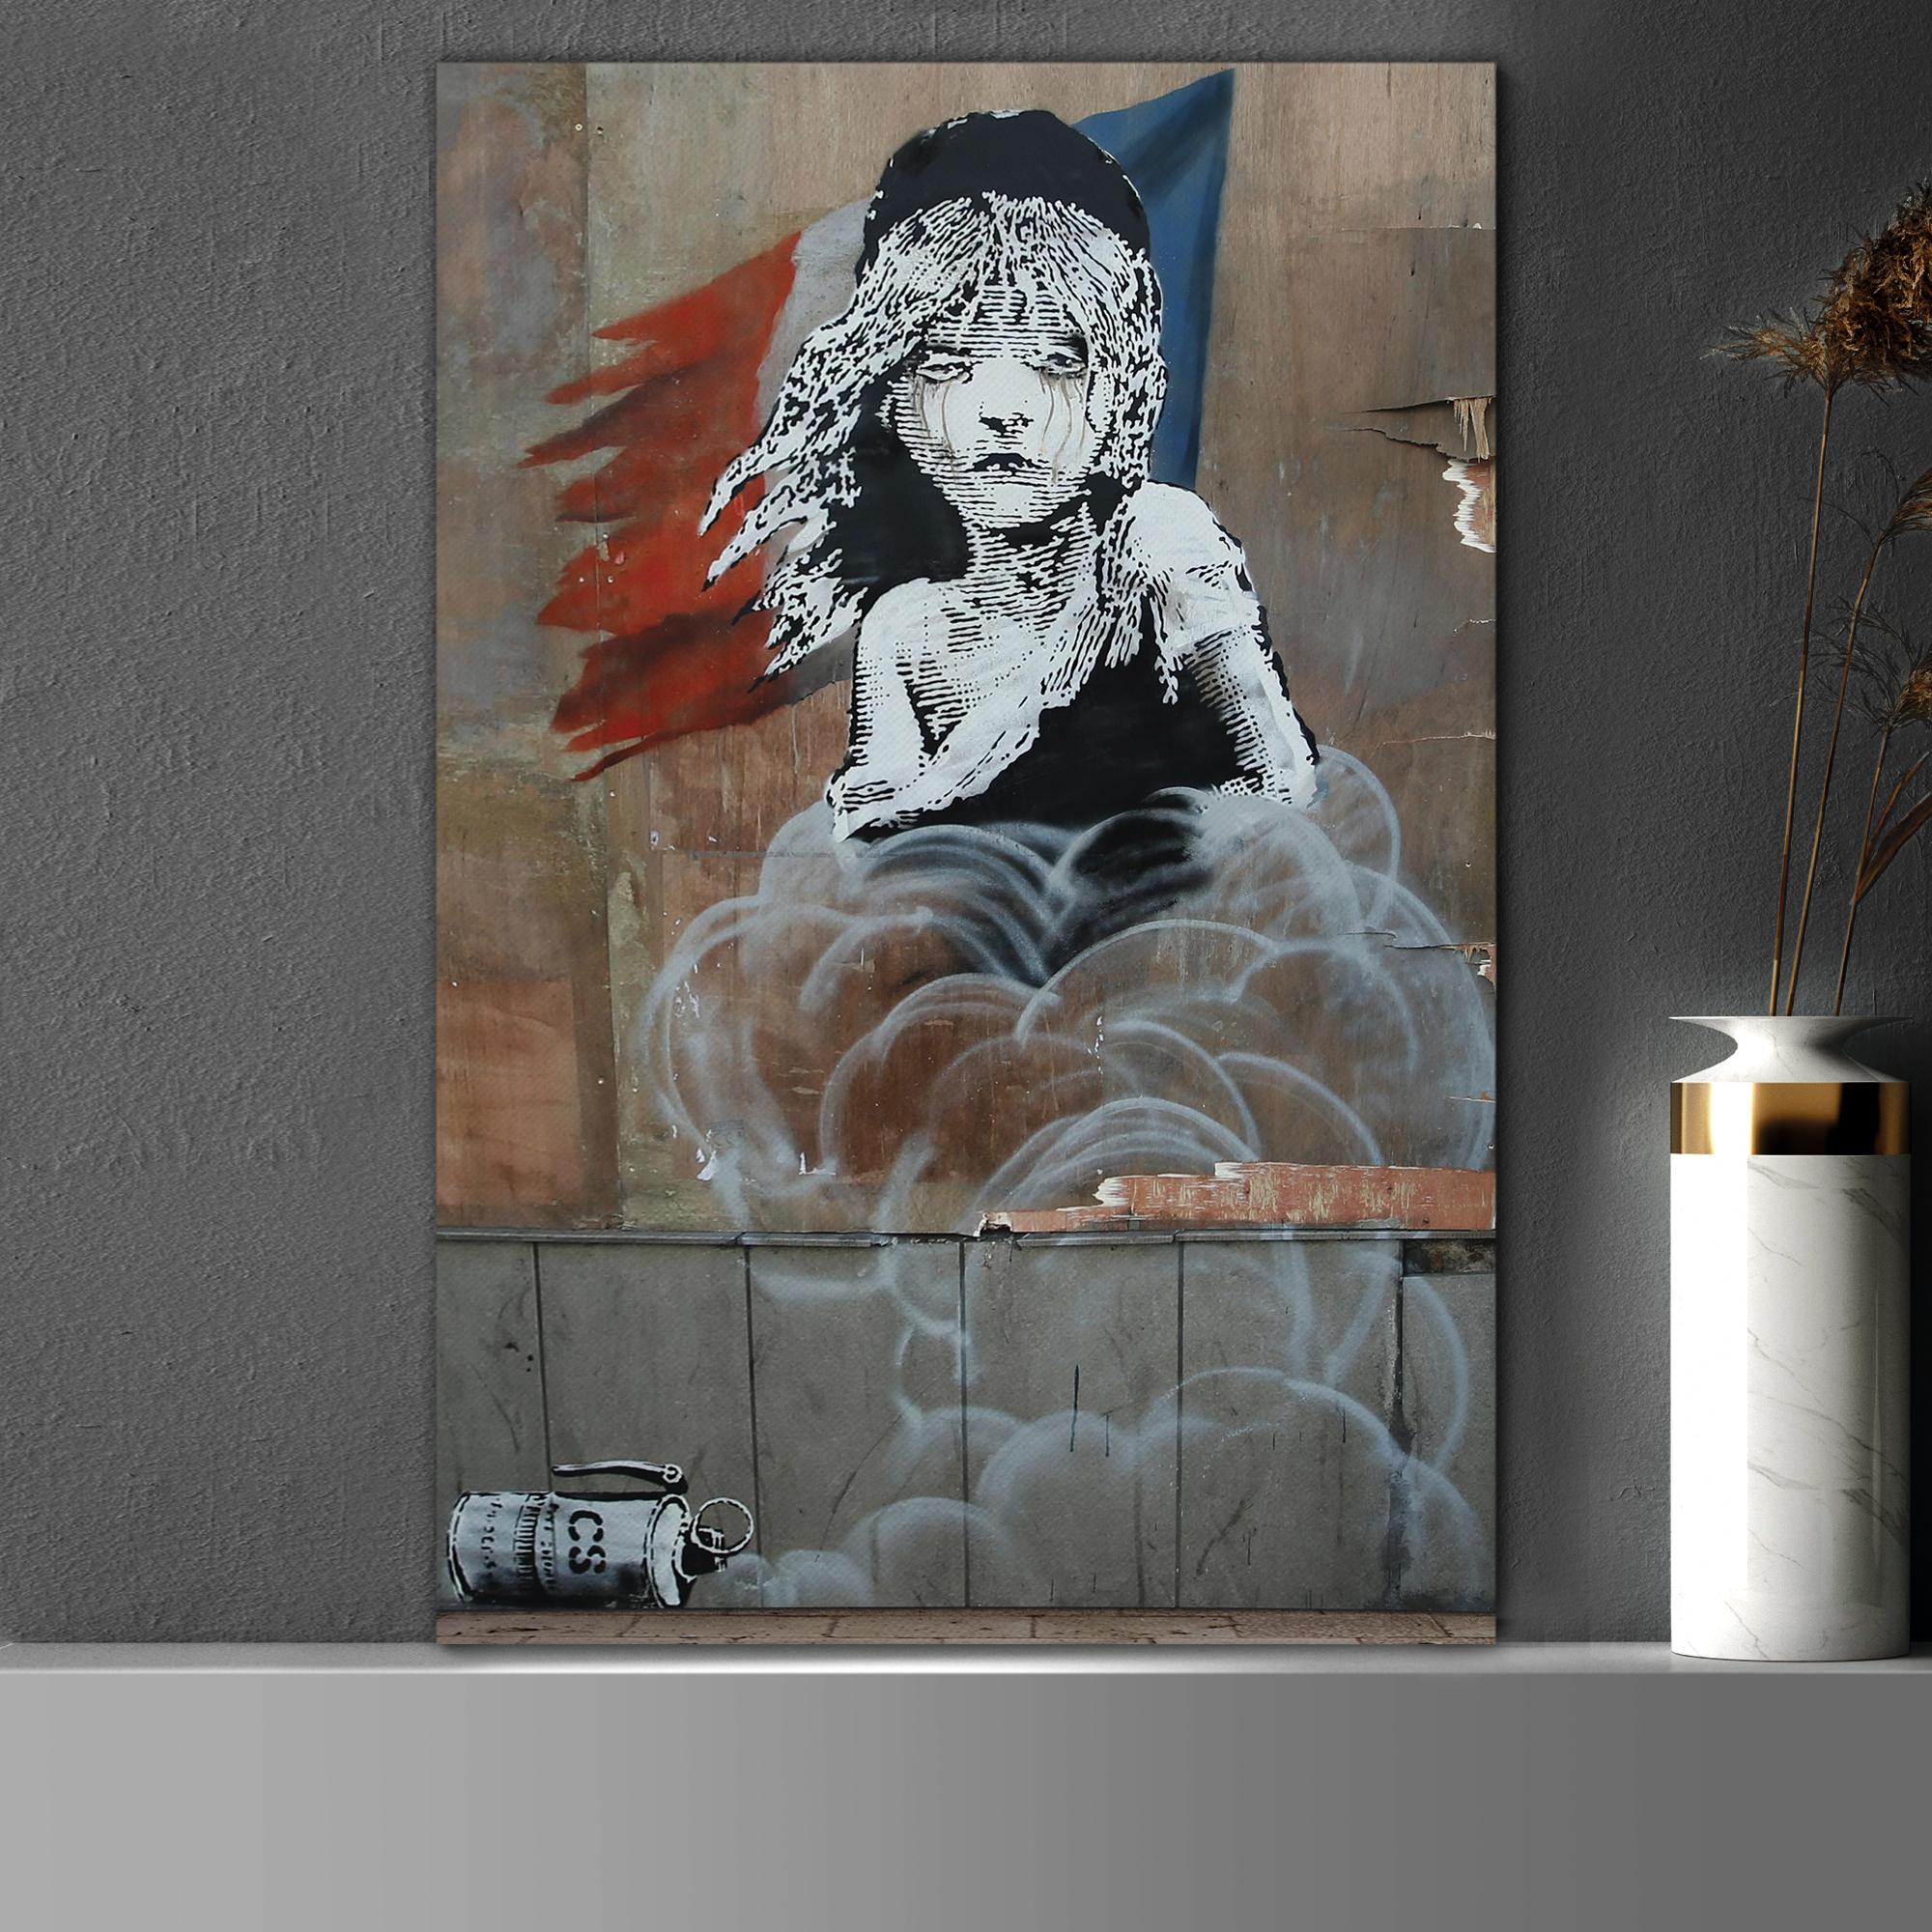 Les Miserables Flag Artwork by Banksy